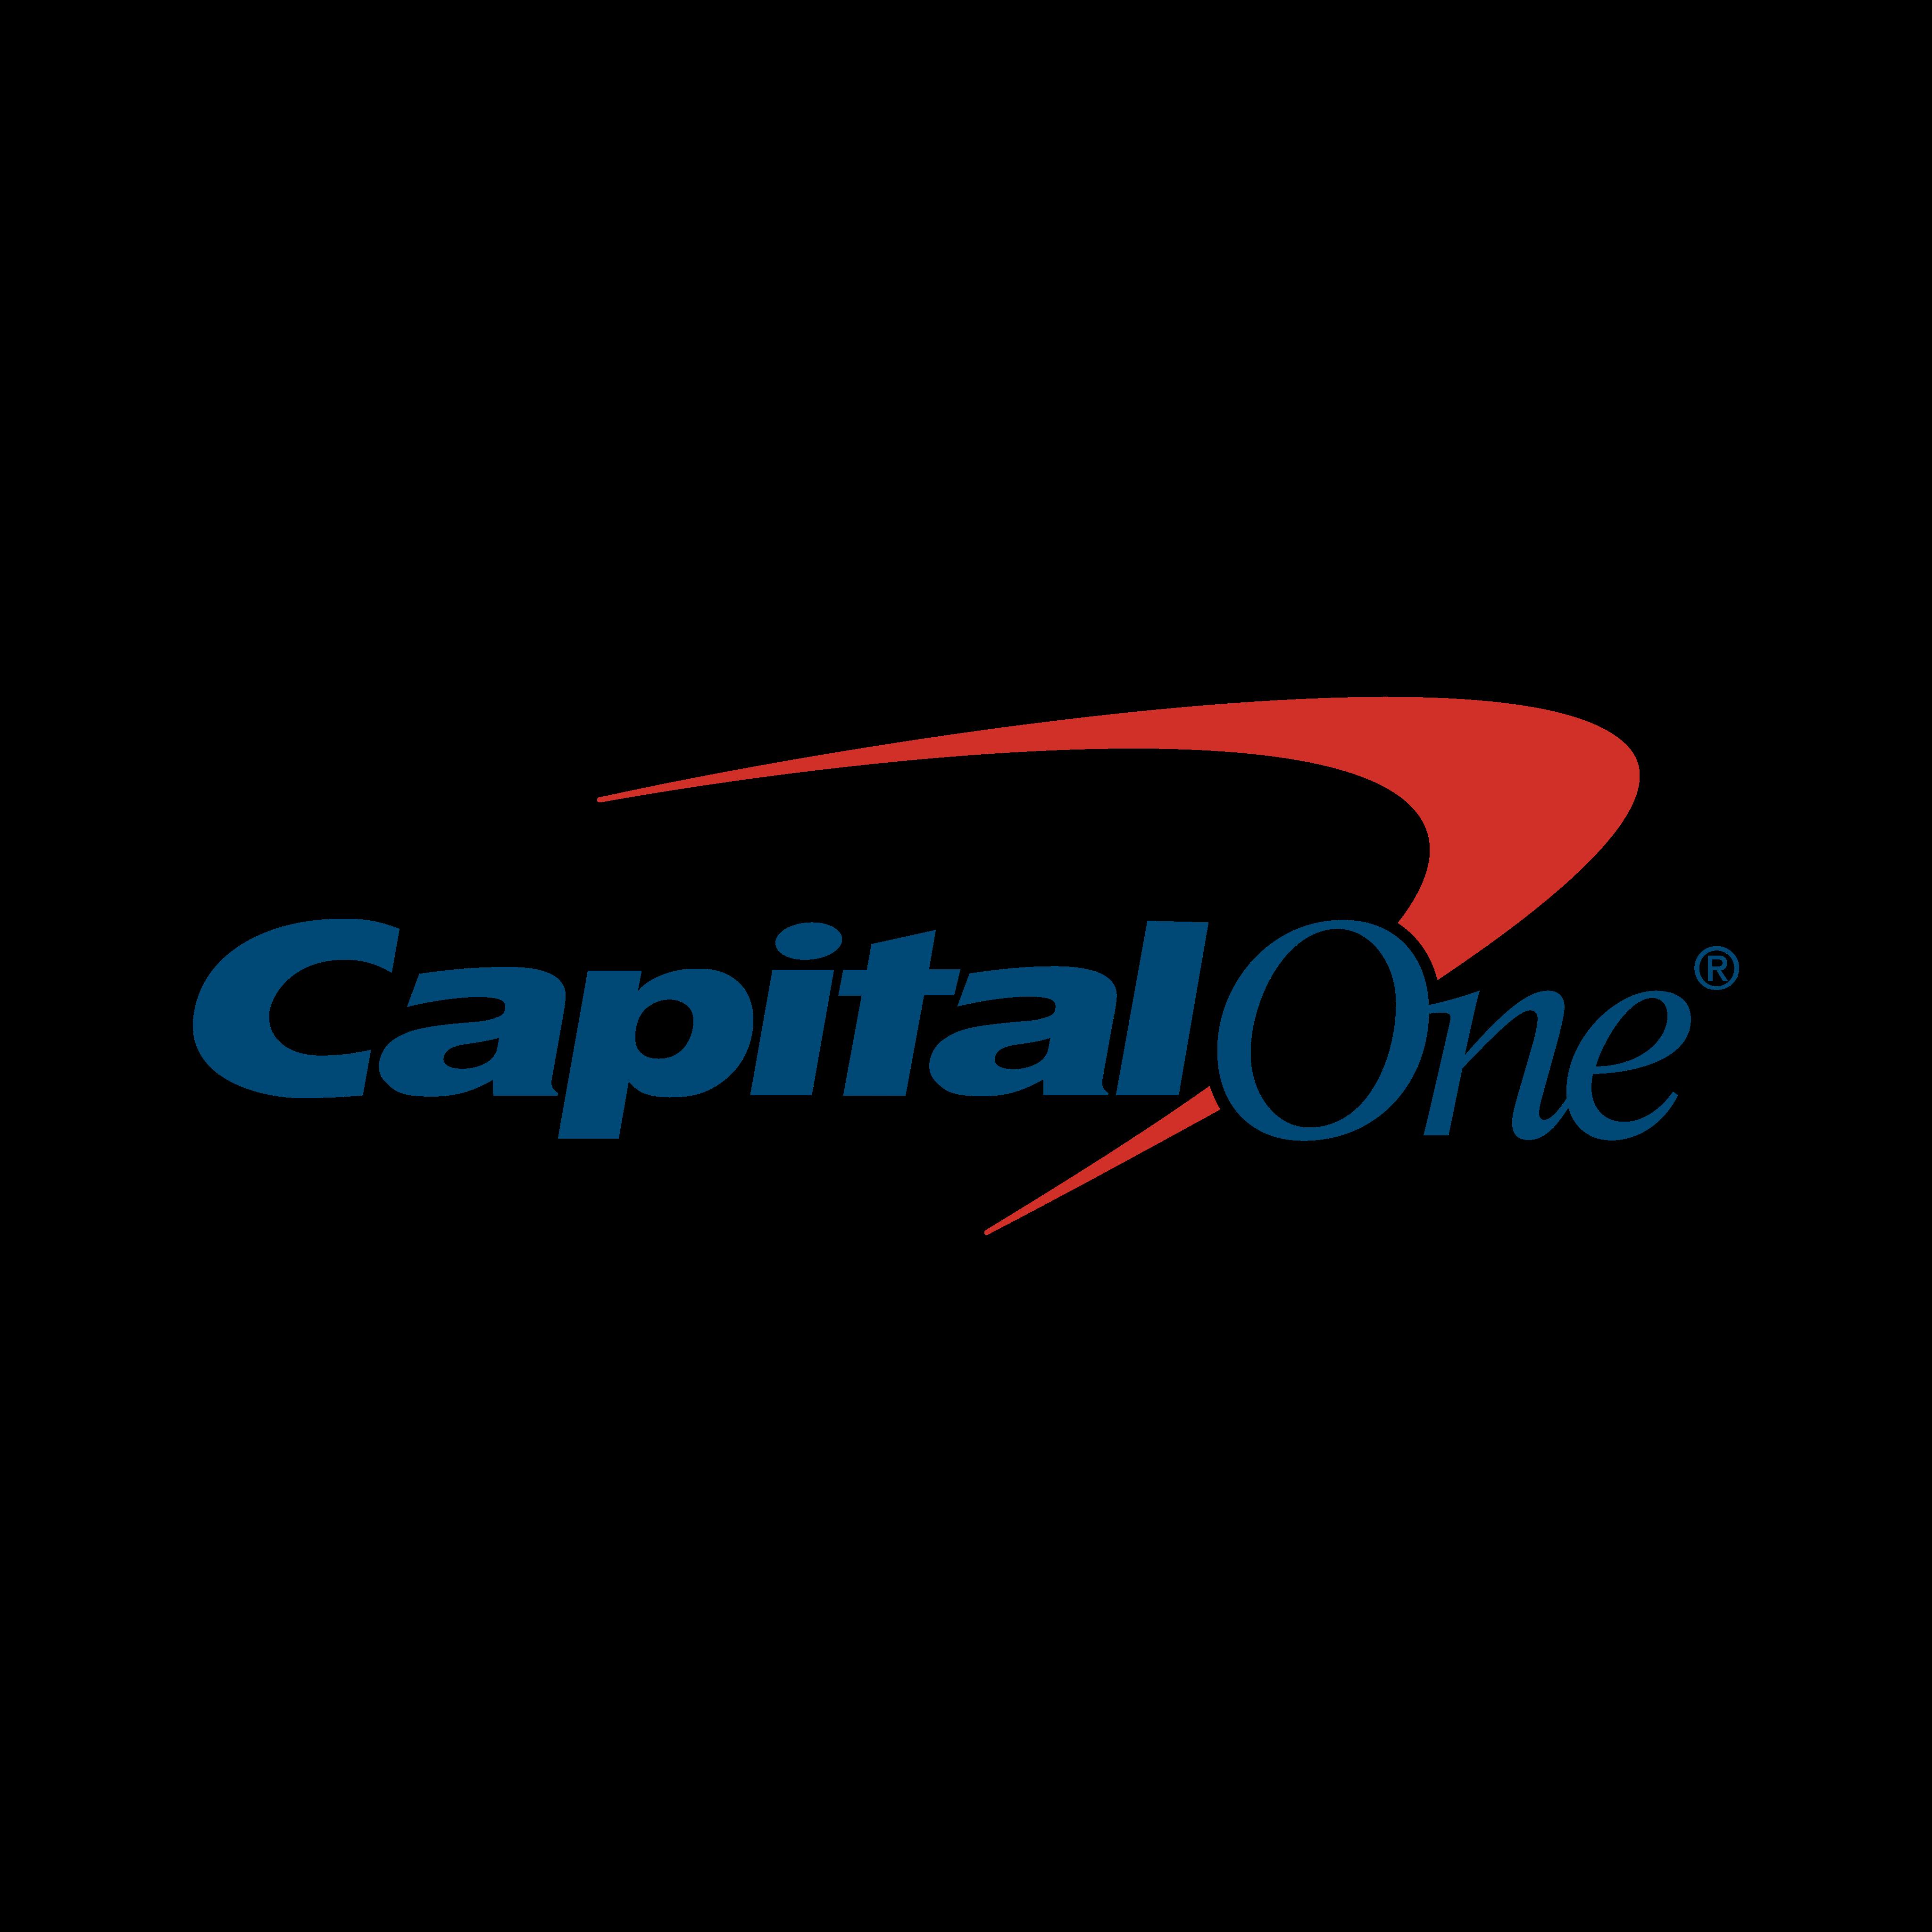 capital one logo 0 - Capital One Logo